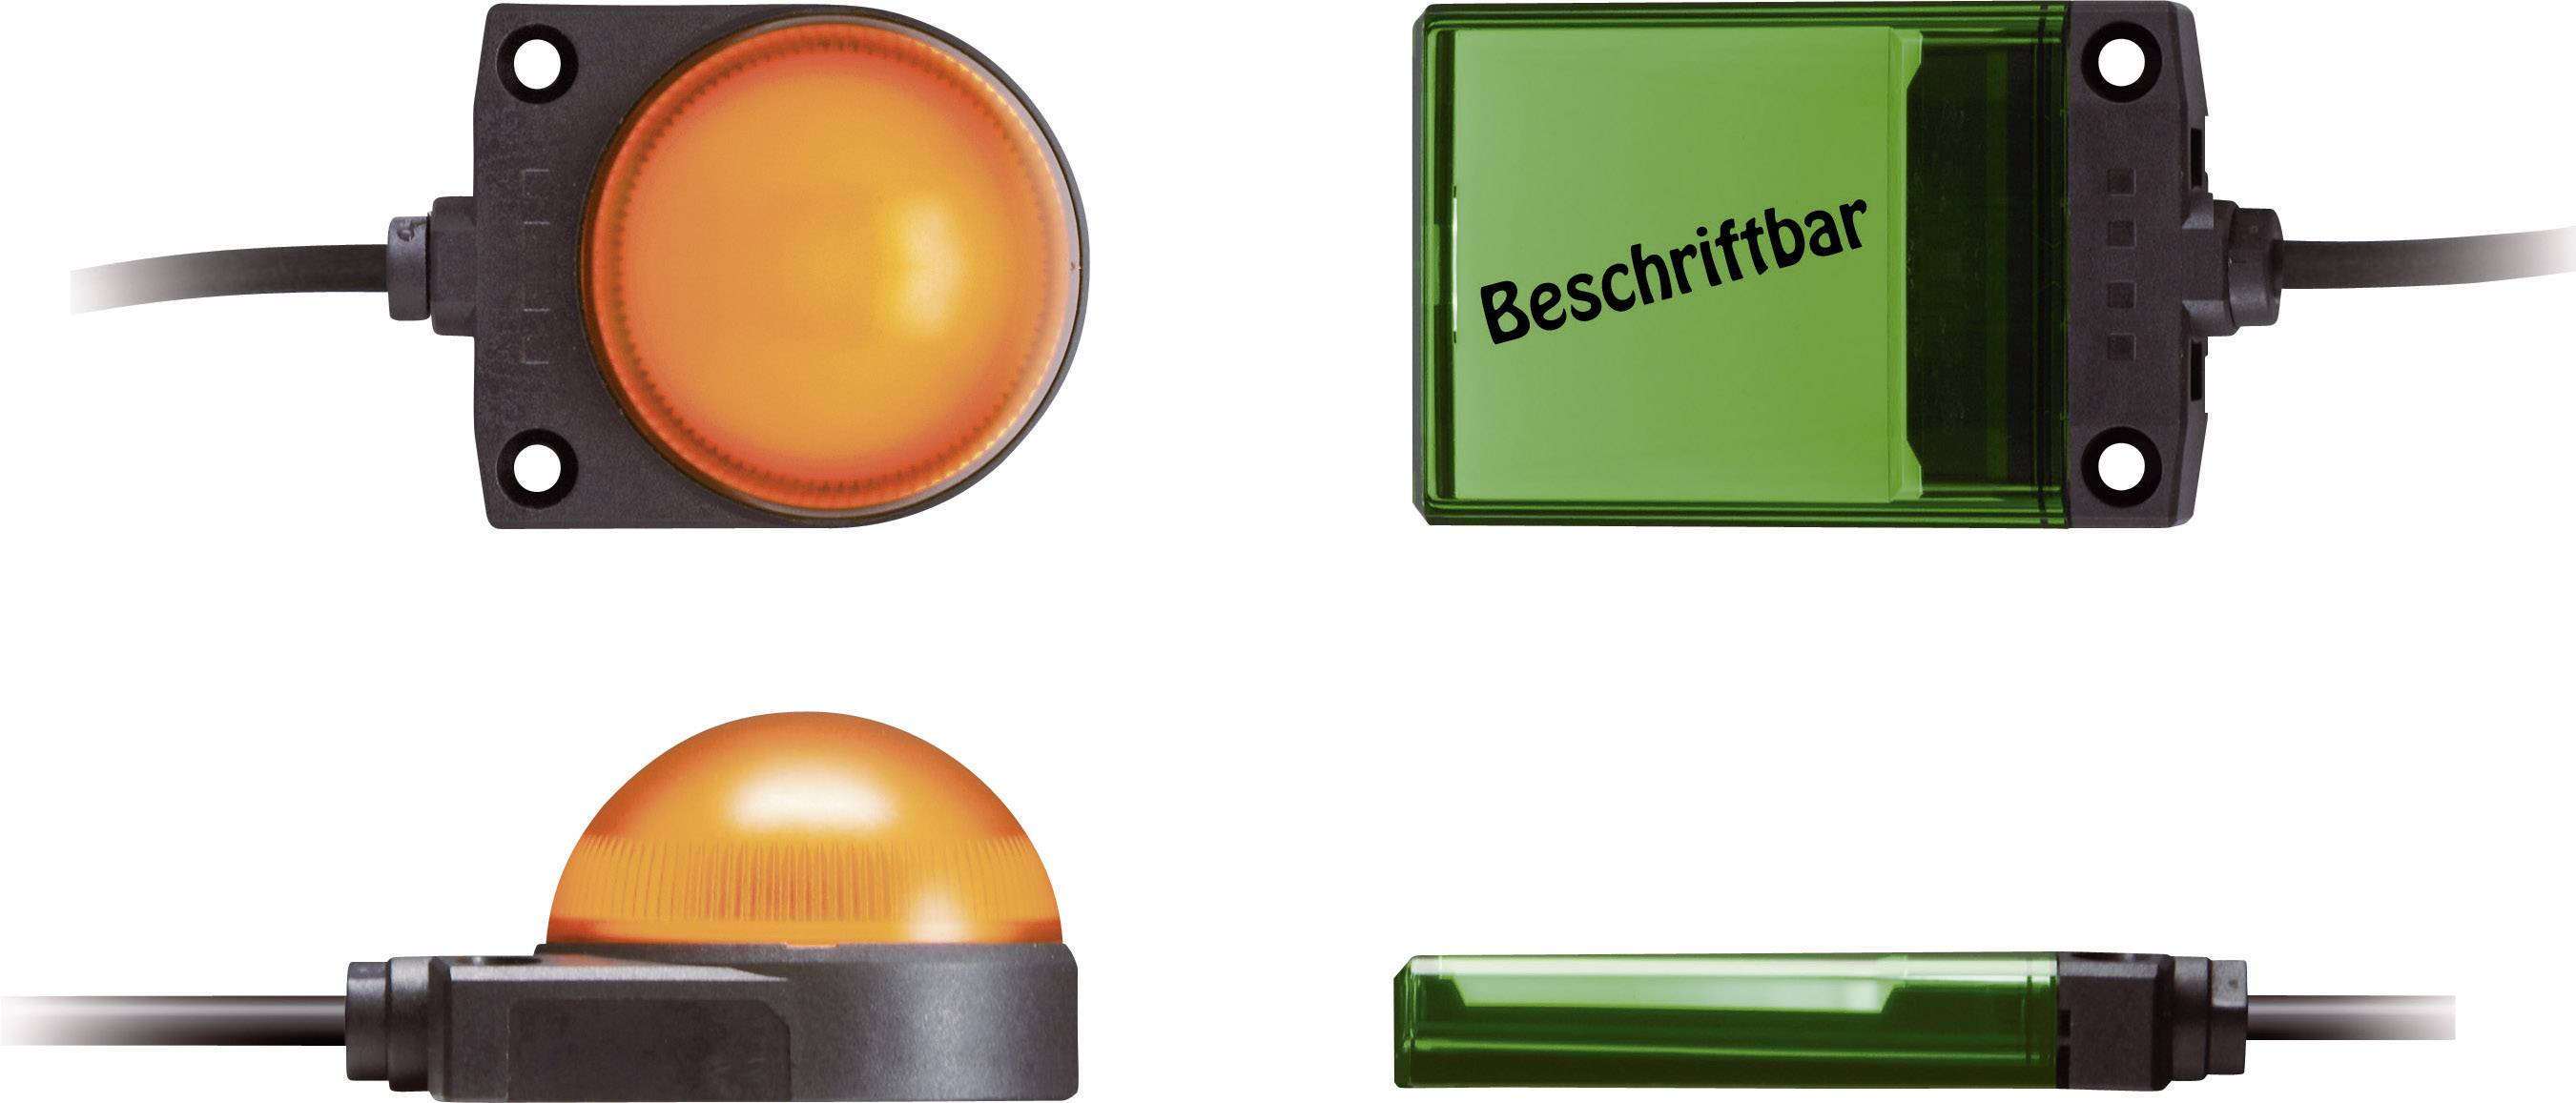 Signalizačné osvetlenie LED Idec LH1D-H2HQ4C30G, 24 V/DC, 24 V/AC, zelená